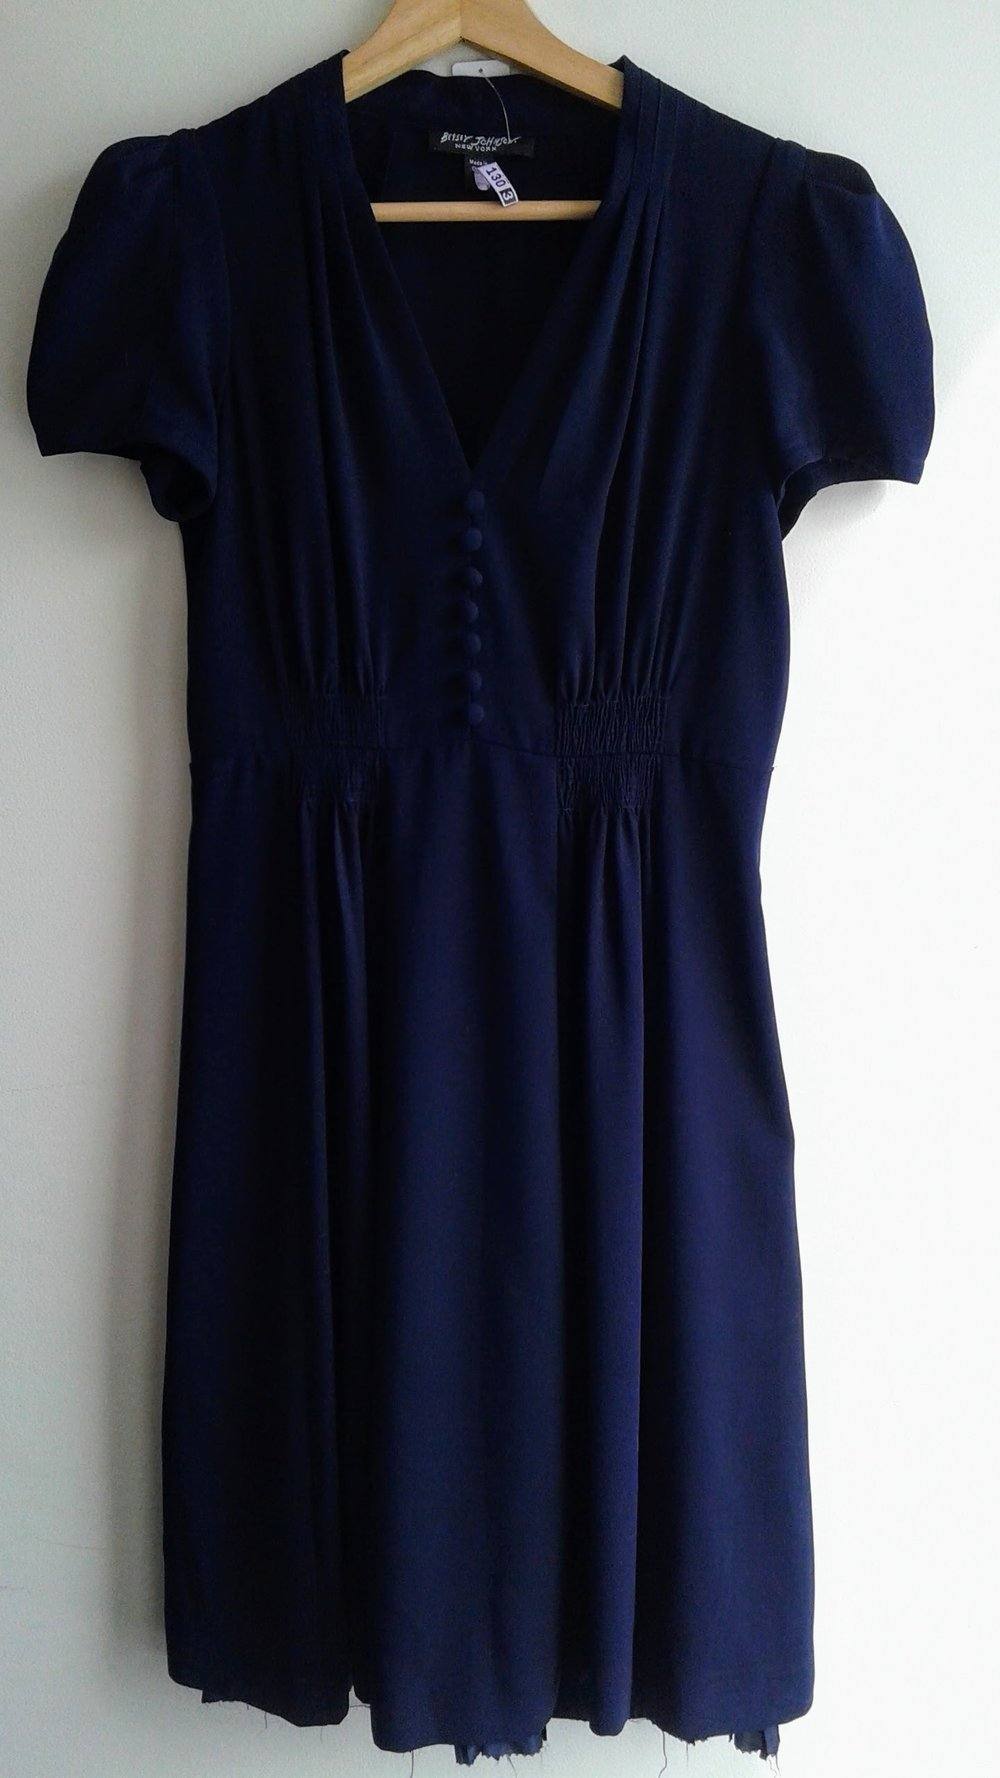 Betsy Johnson dress; Size 6, $48